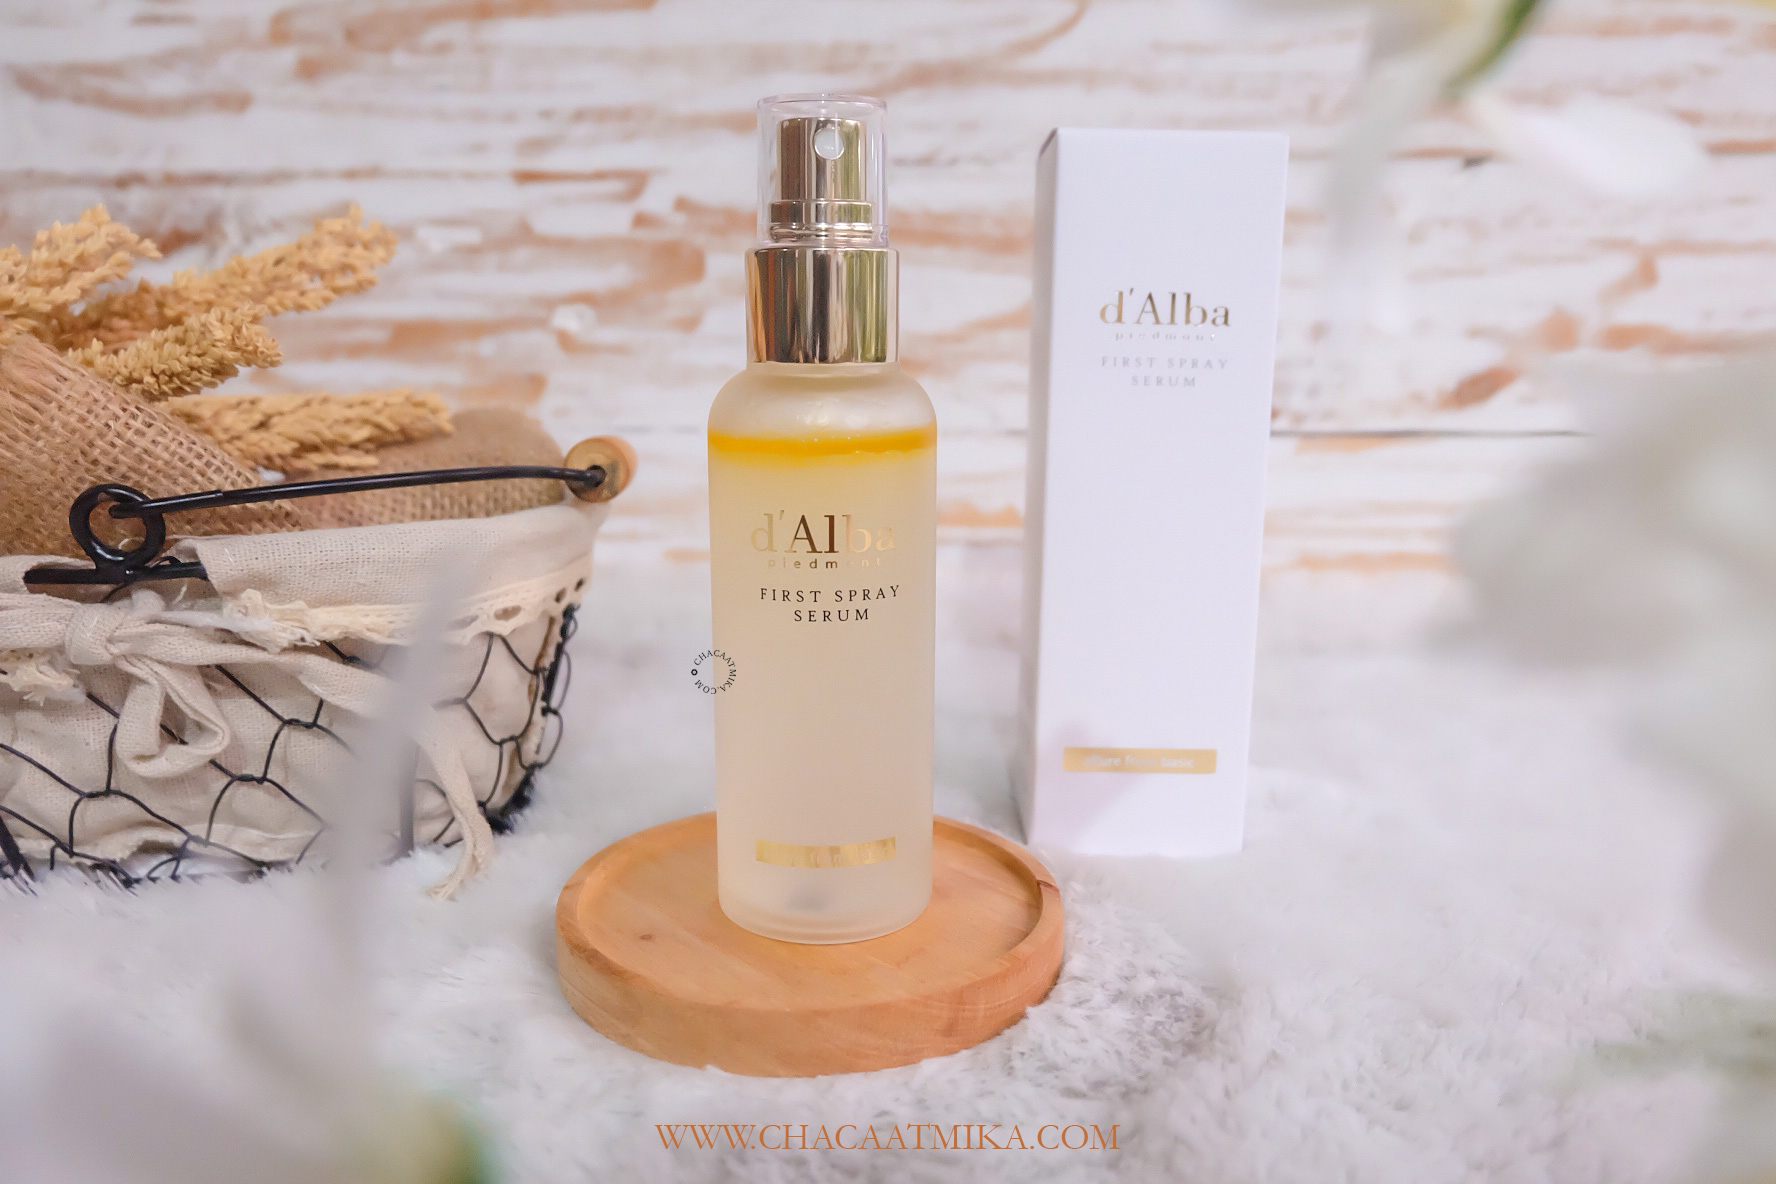 Review d'Alba White Truffle First Spray Serum Korea